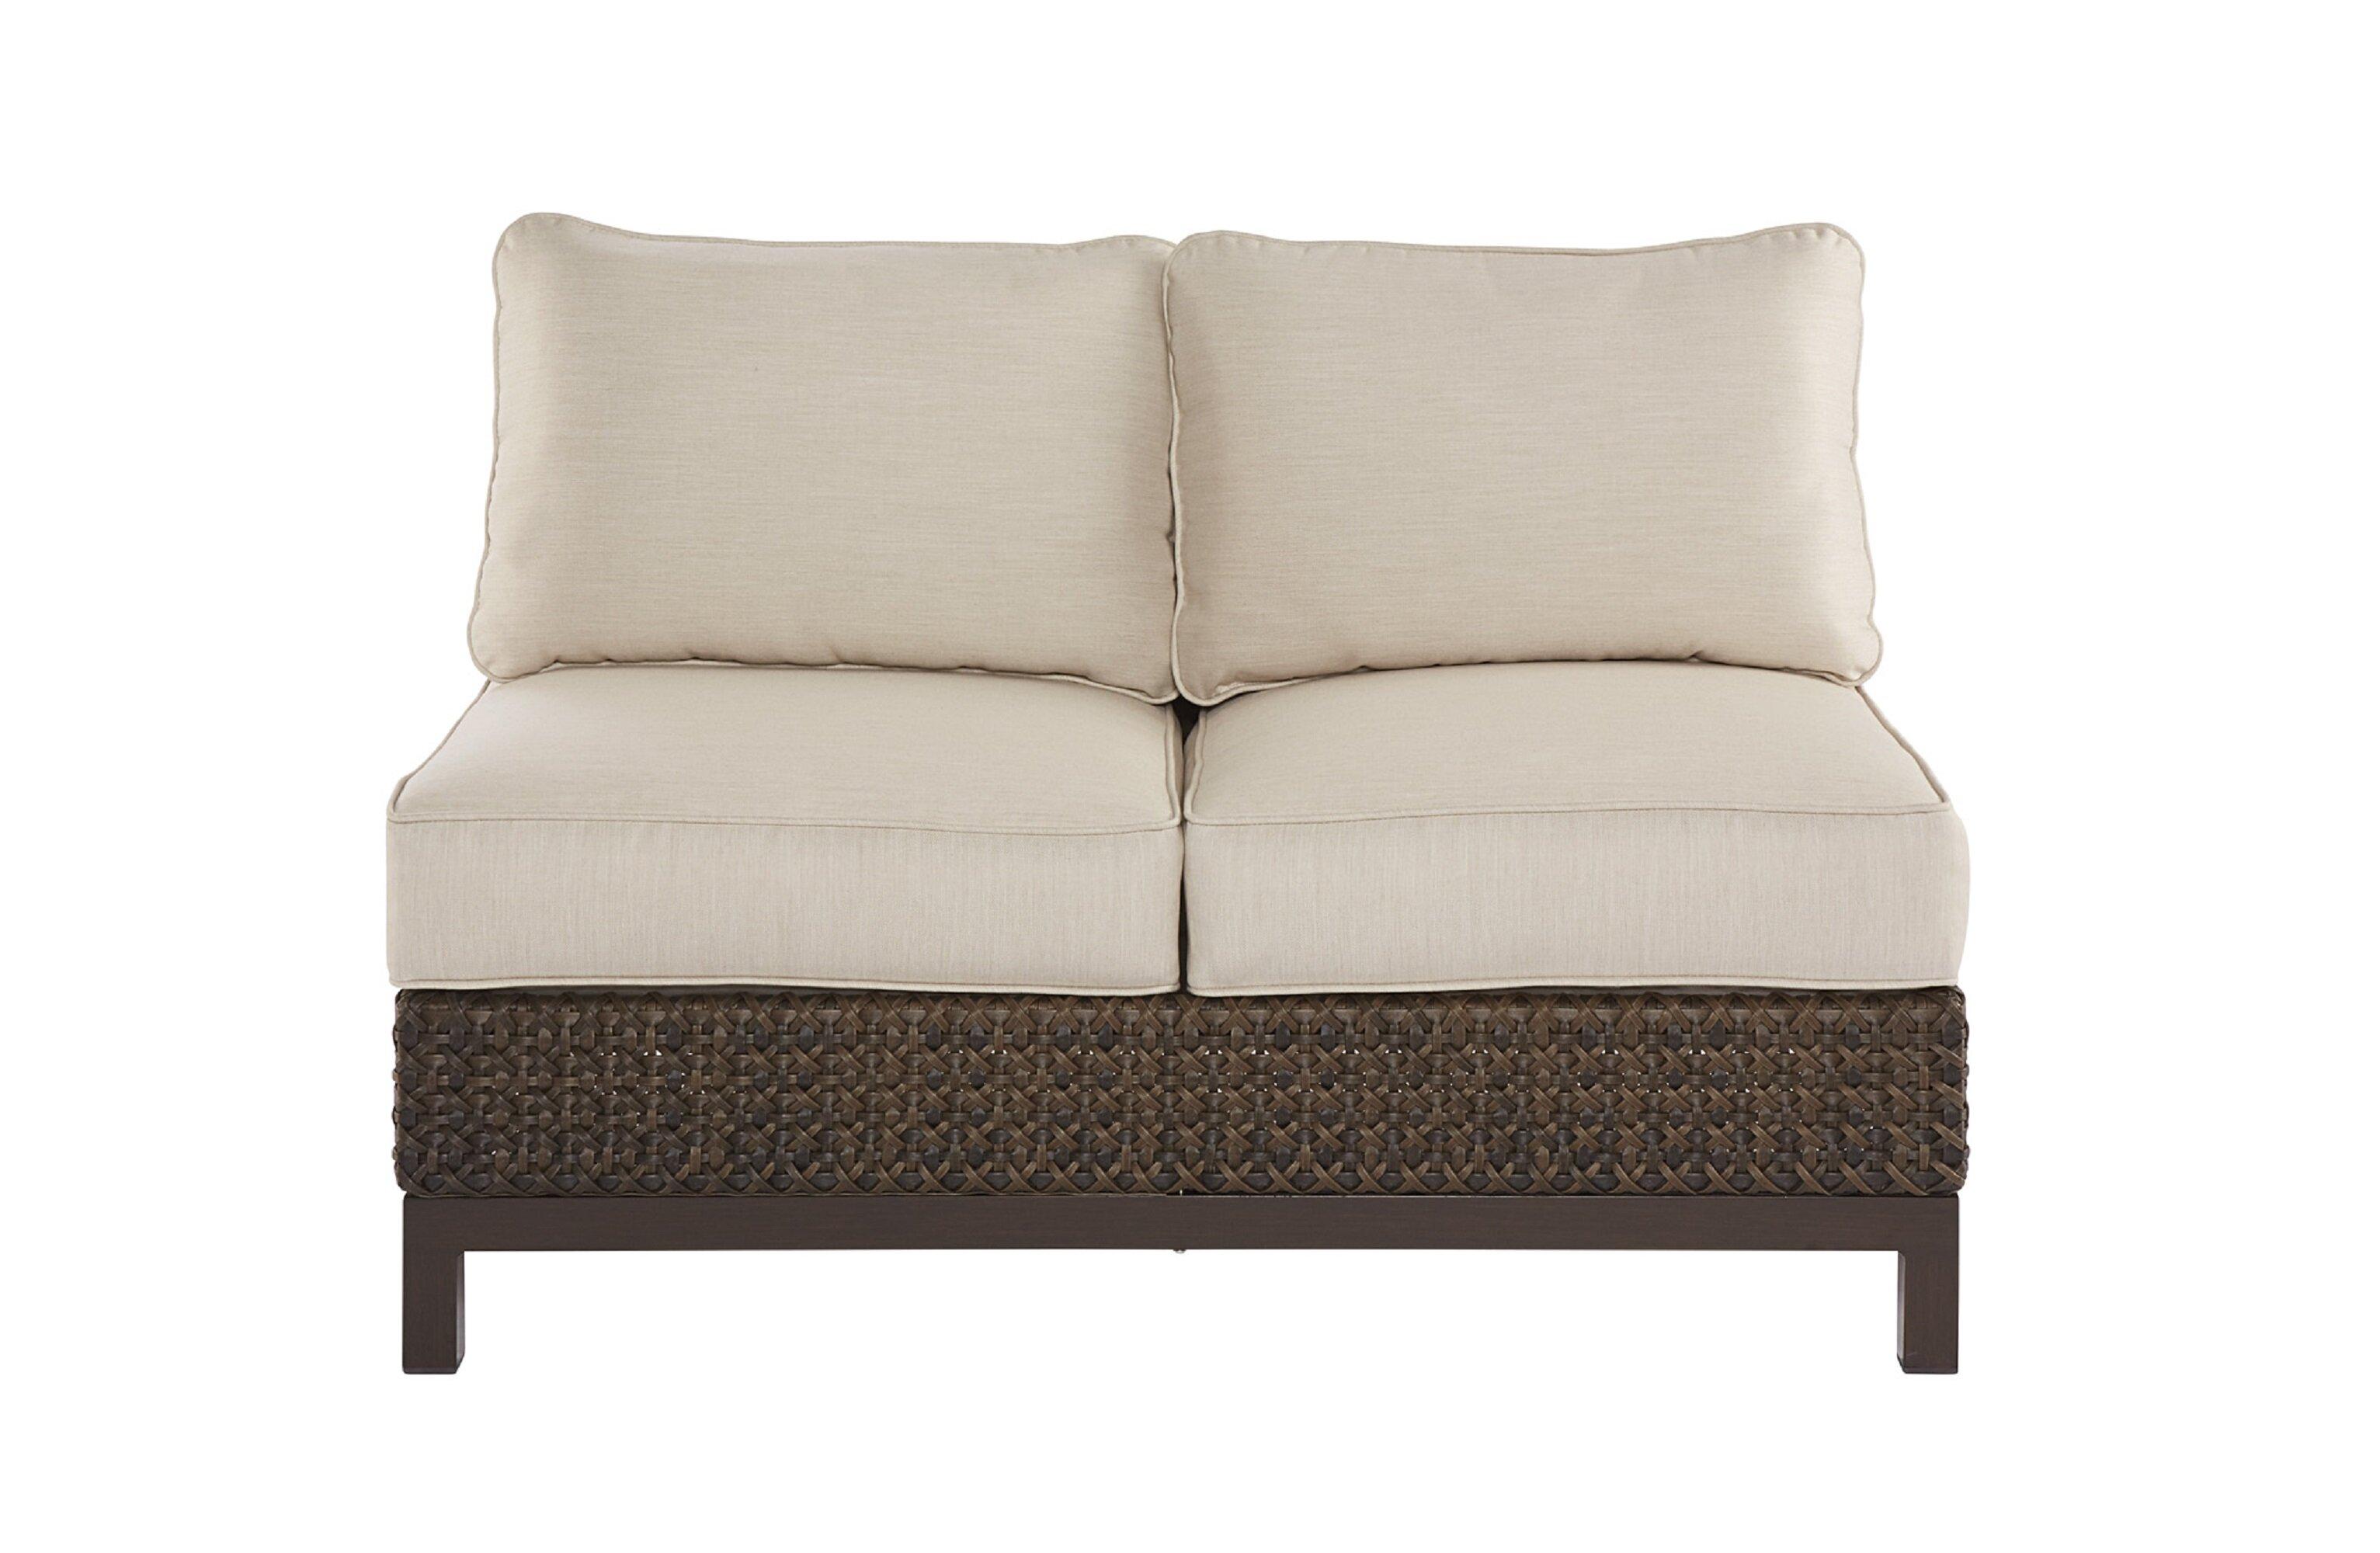 Beau Asphodèle Wicker Patio Loveseat With Cushions